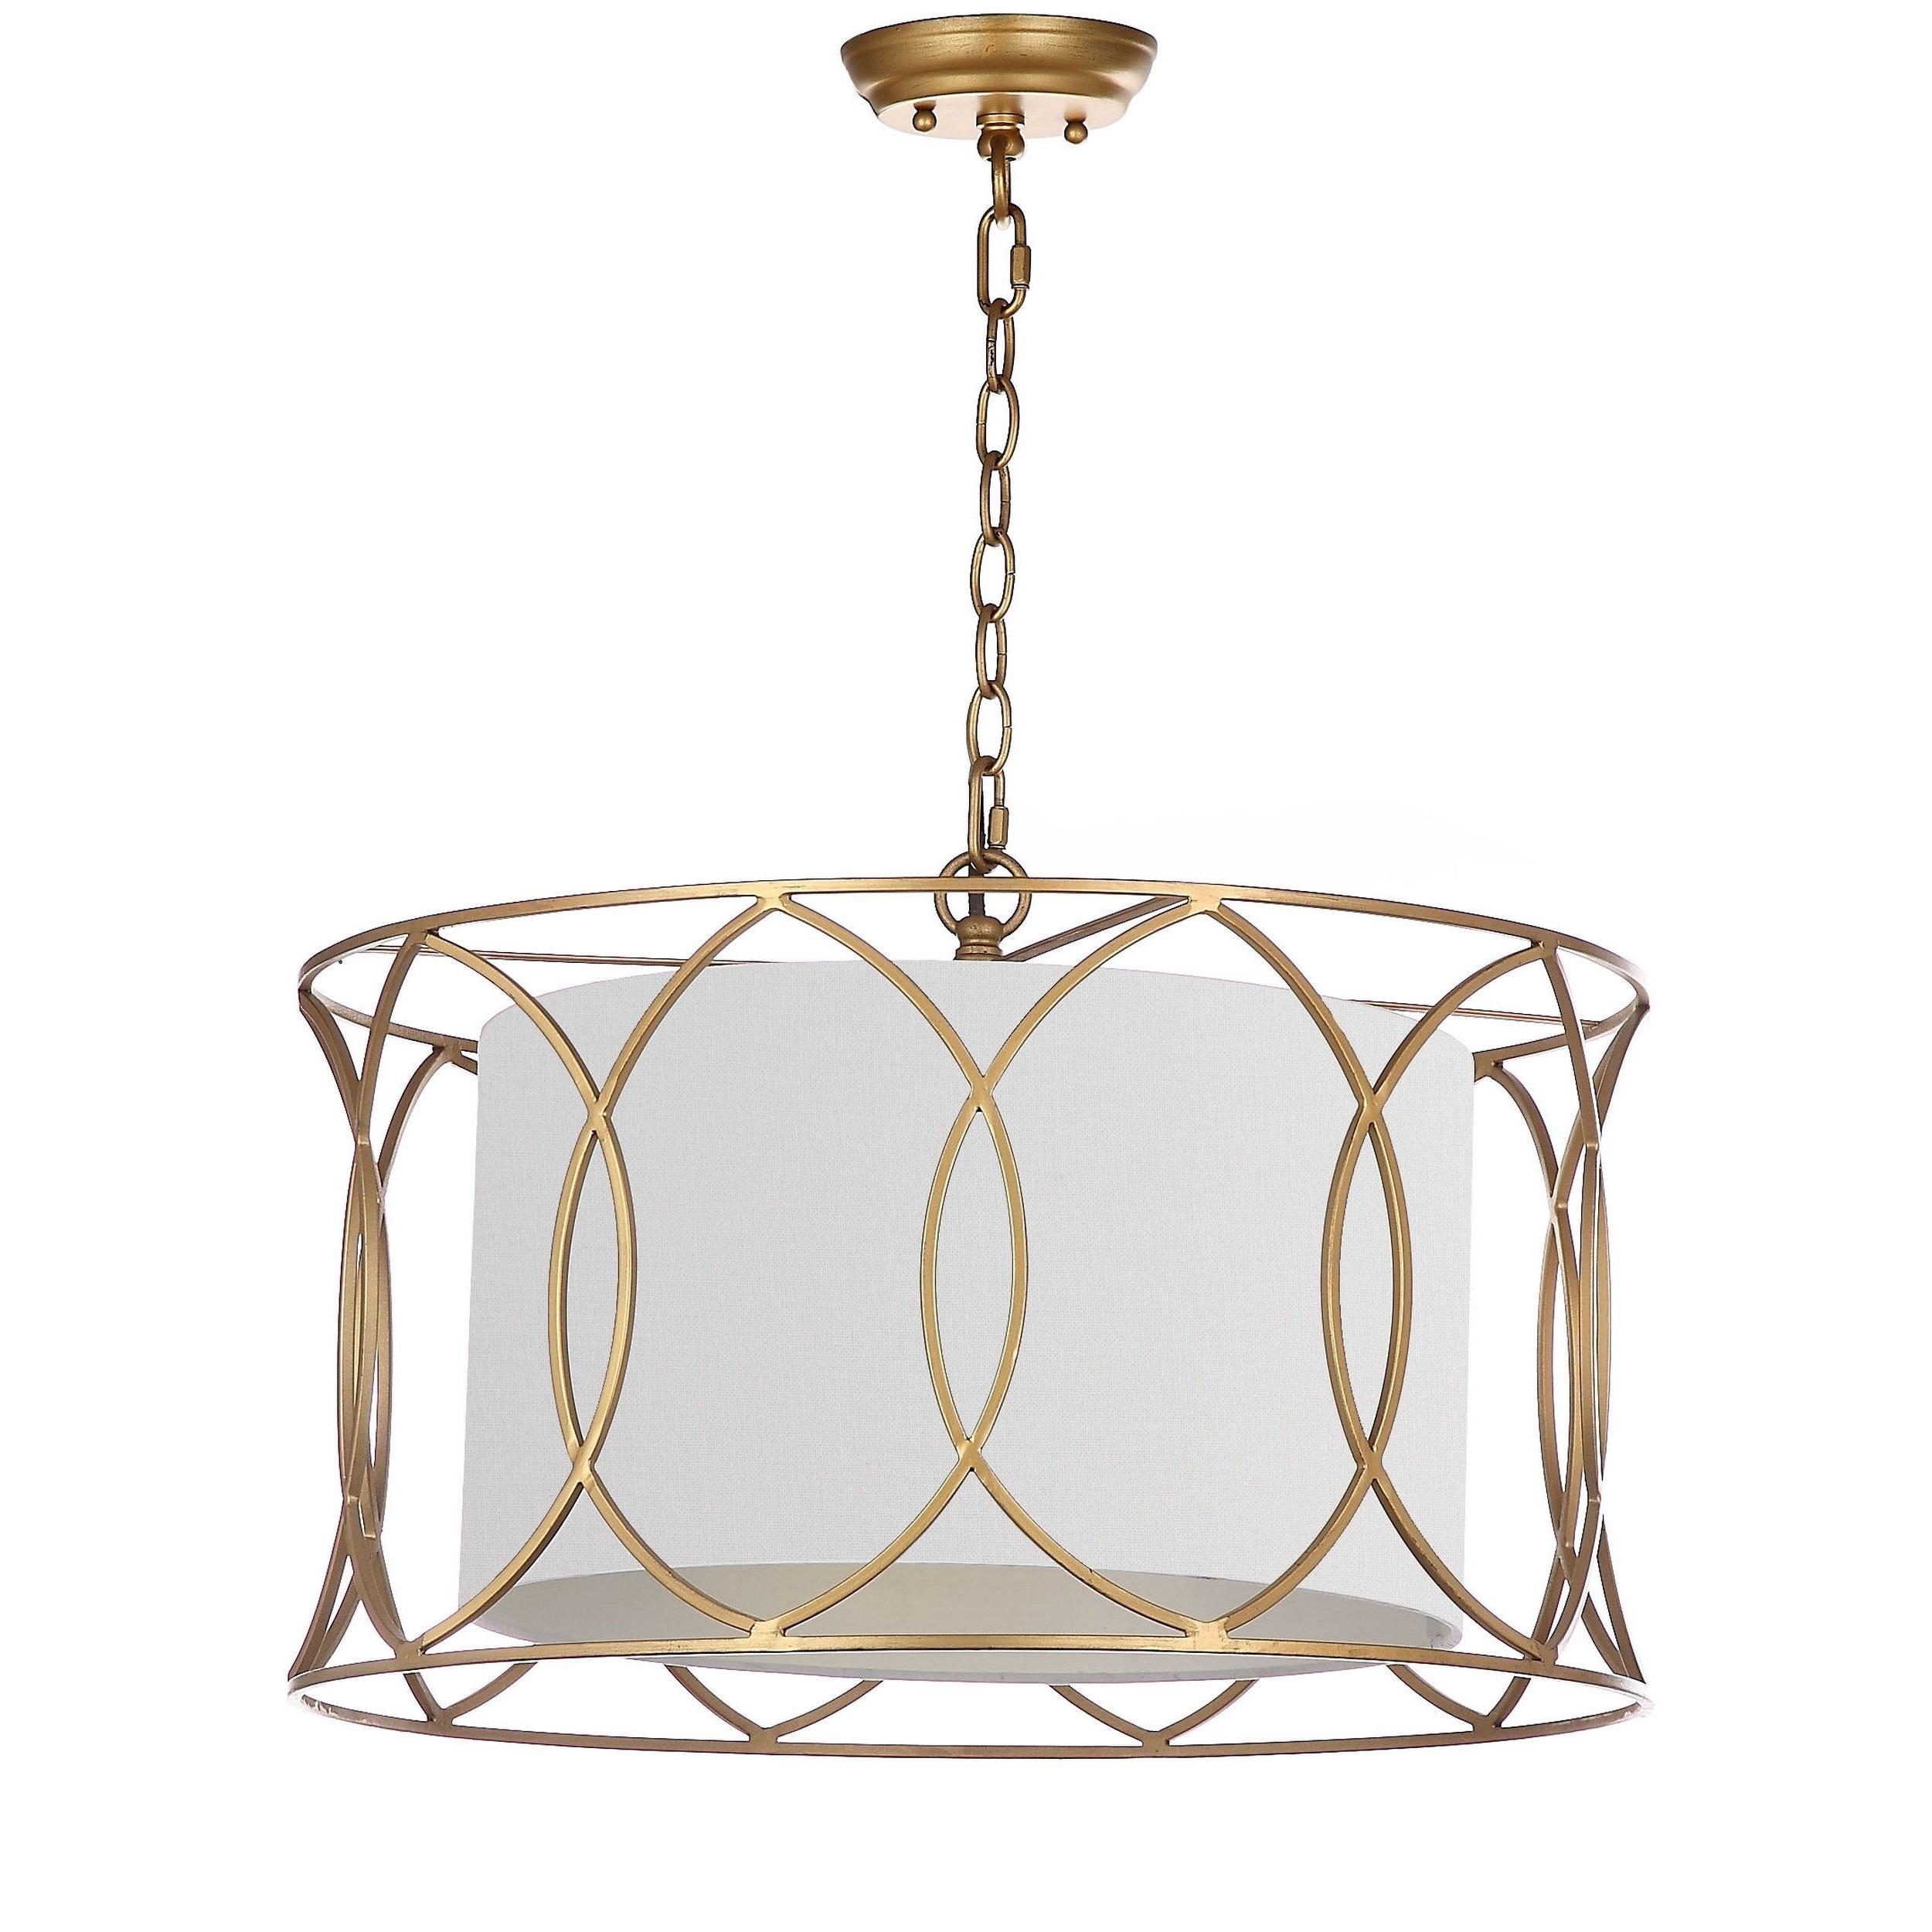 Armande 3 Light Lantern Geometric Pendants Regarding Most Current Safavieh Lighting Silas Gold Adjustable Pendant Lamp (View 4 of 20)